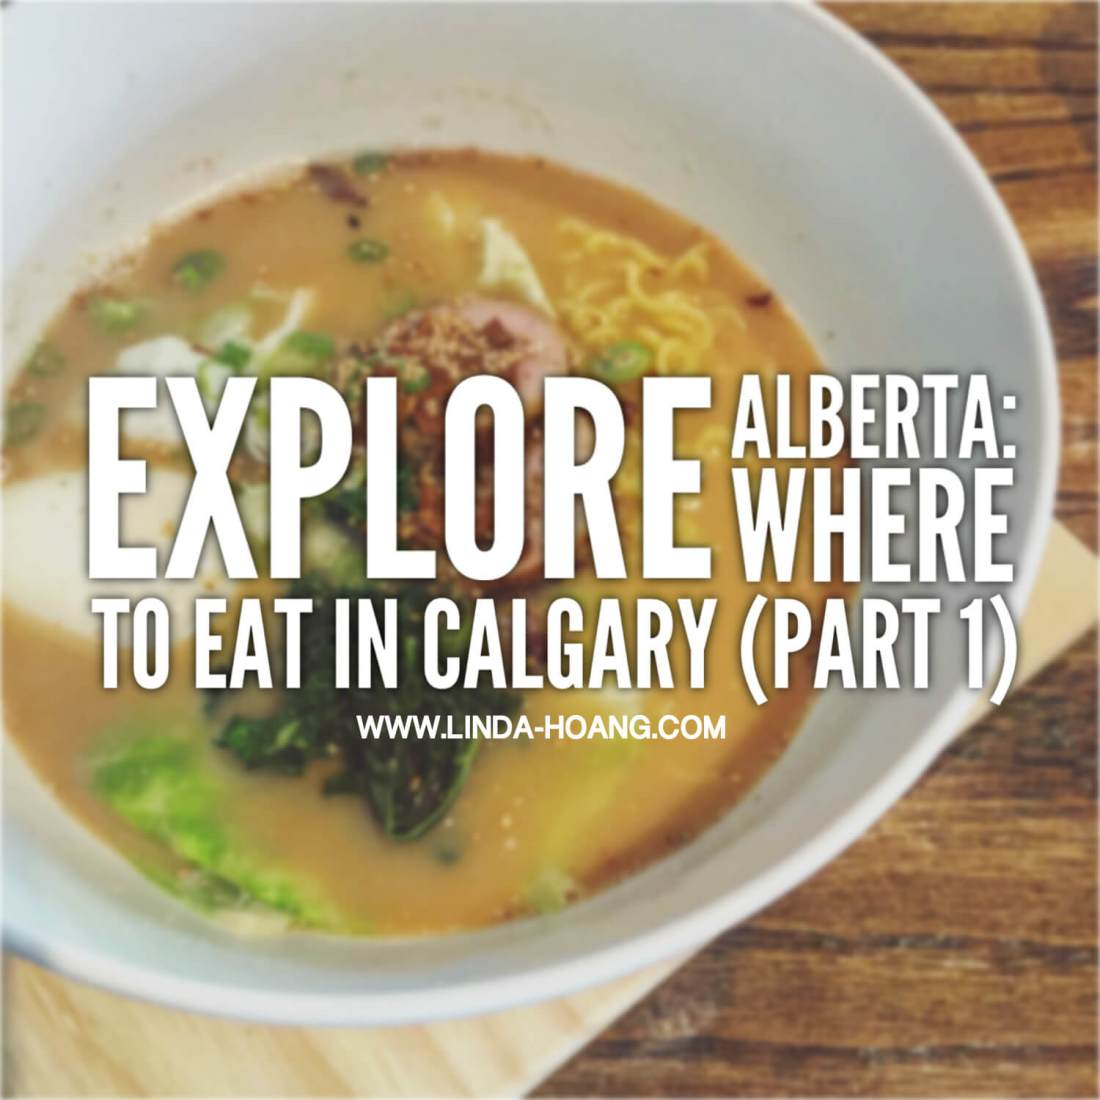 Explore Alberta - Where to eat in Calgary